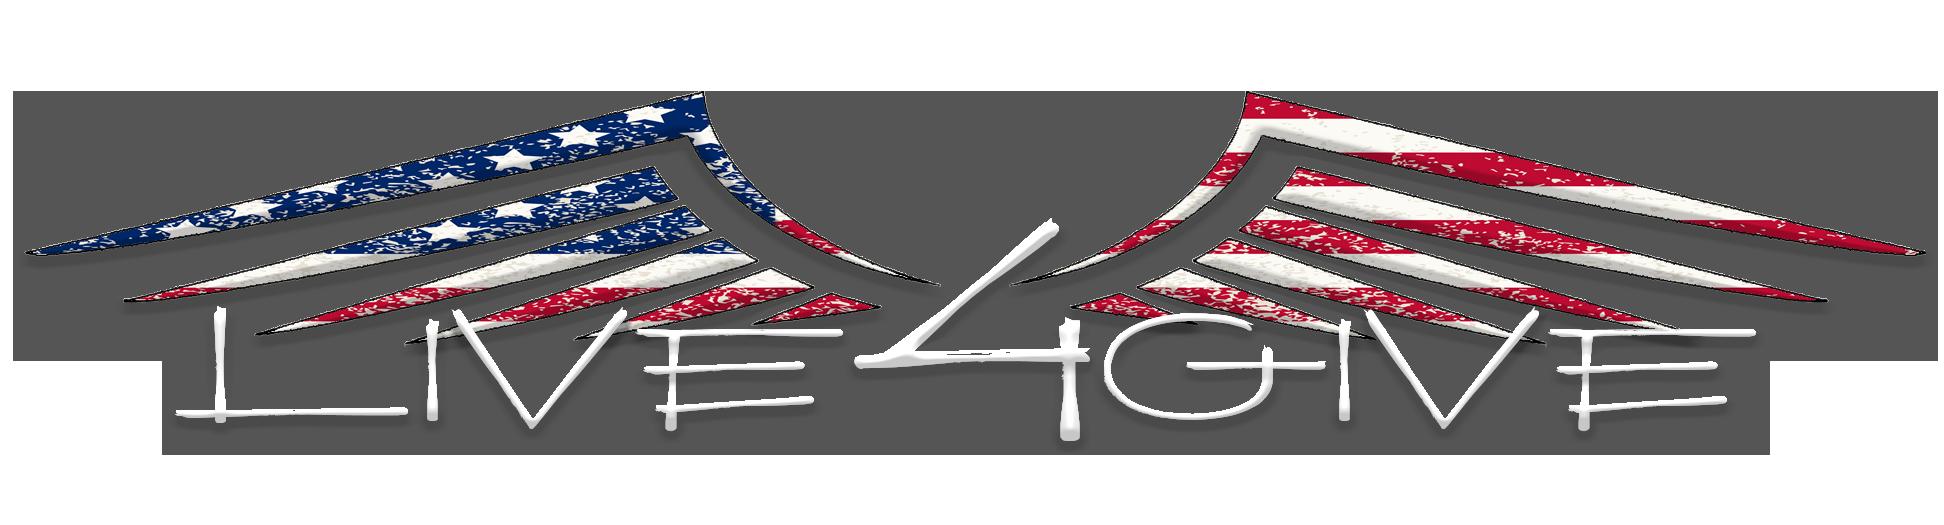 L4G_new_USA